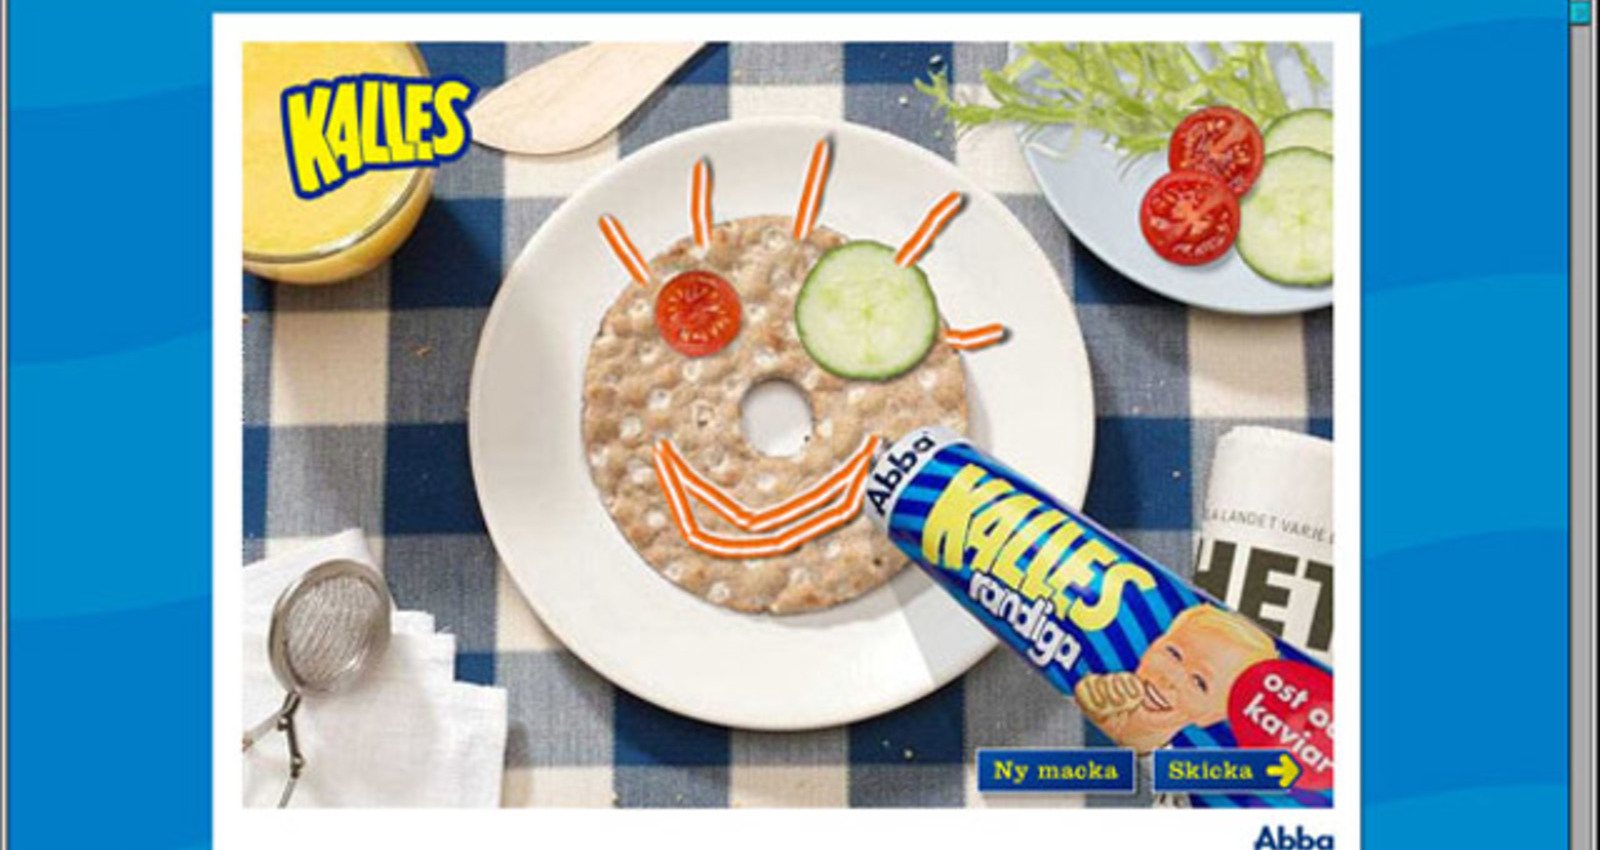 KALLES-WIN A REAL SANDWICH-GRAM!